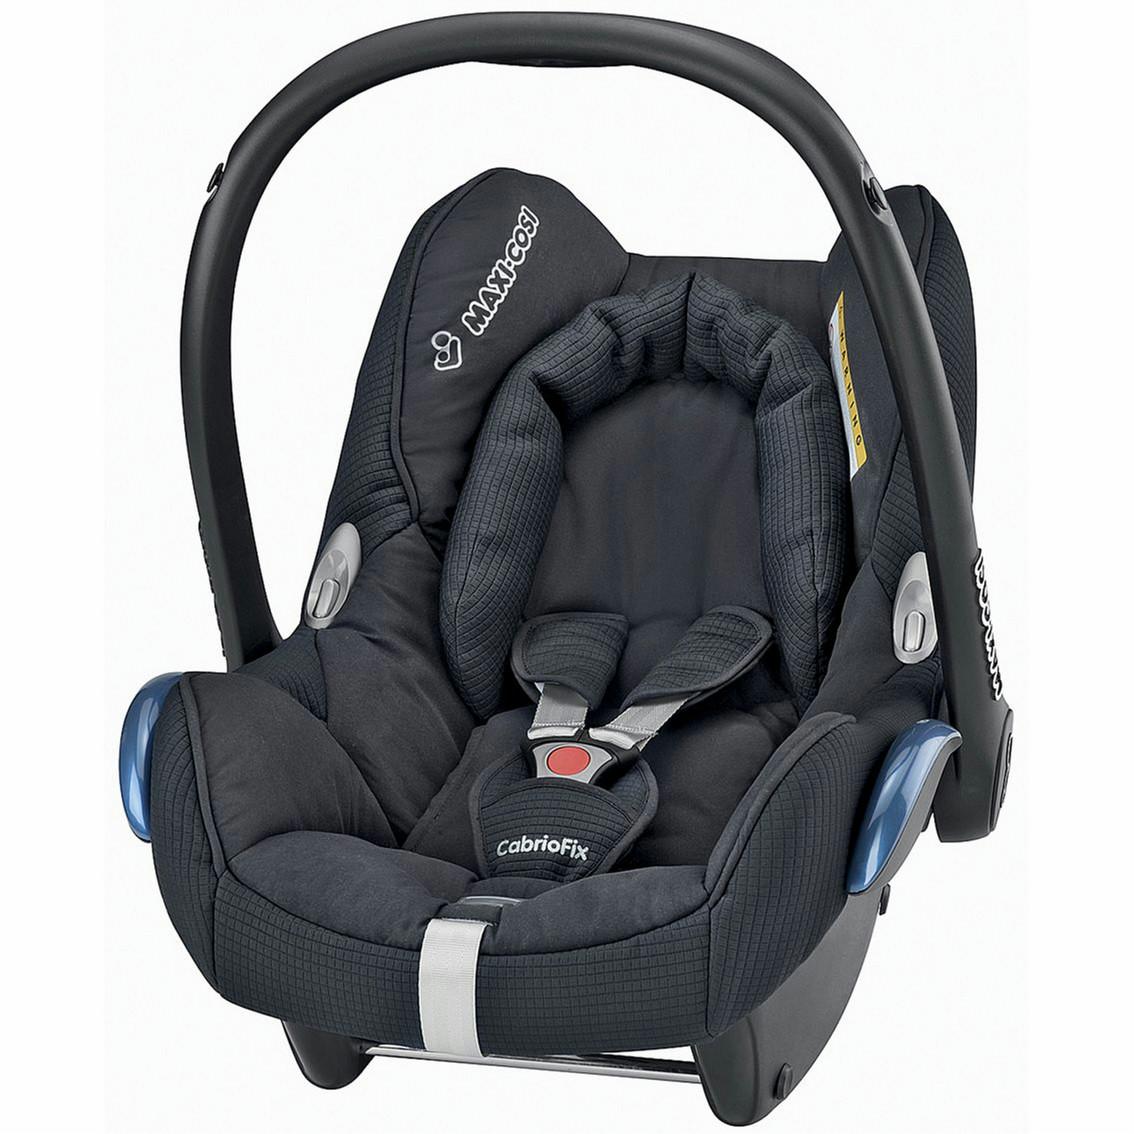 Black Baby Car Seat Maxi Cosi CabrioFix 0